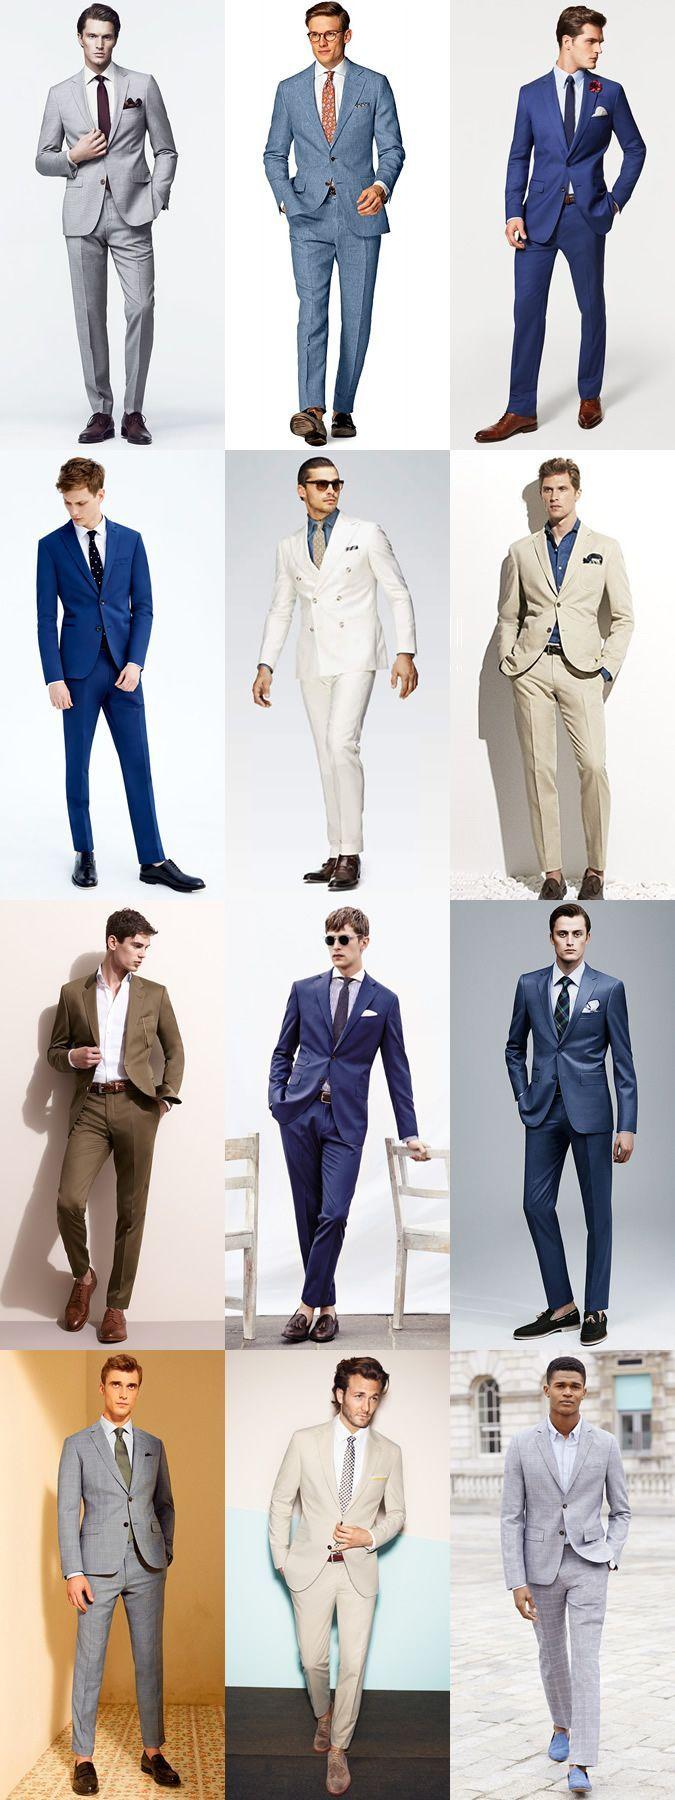 Menus summer wedding outfit inspiration twopiece suits lookbook